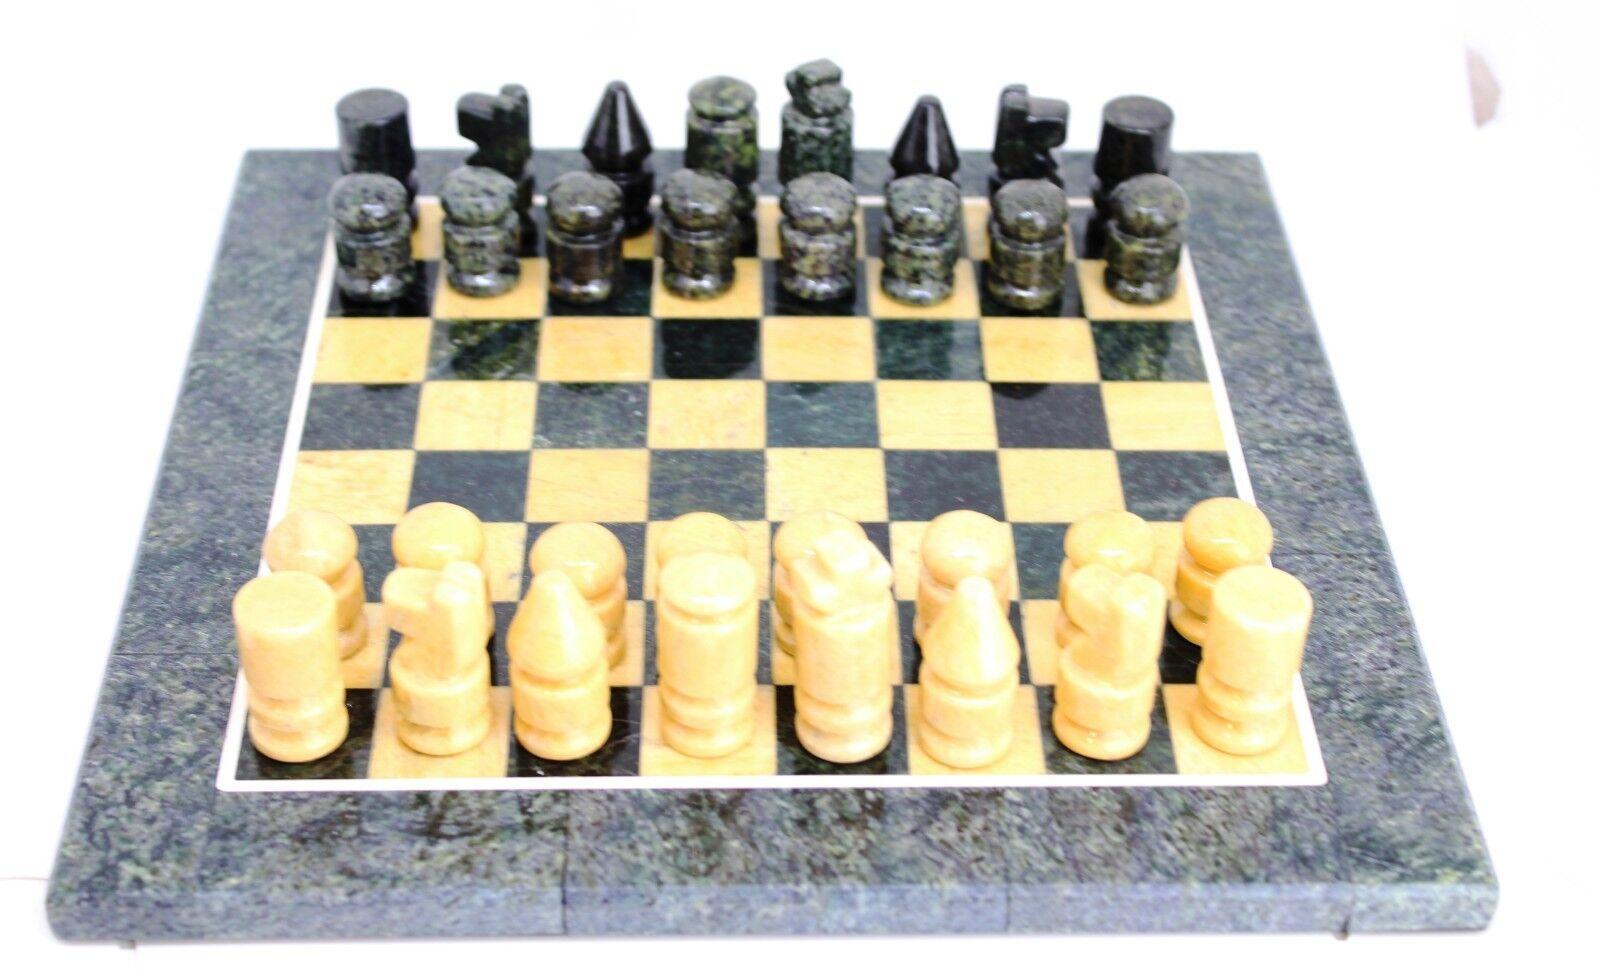 Ajedrez Chess Schack Piedra Calcite Serpentinite Crystal Piedra Stone Mineral